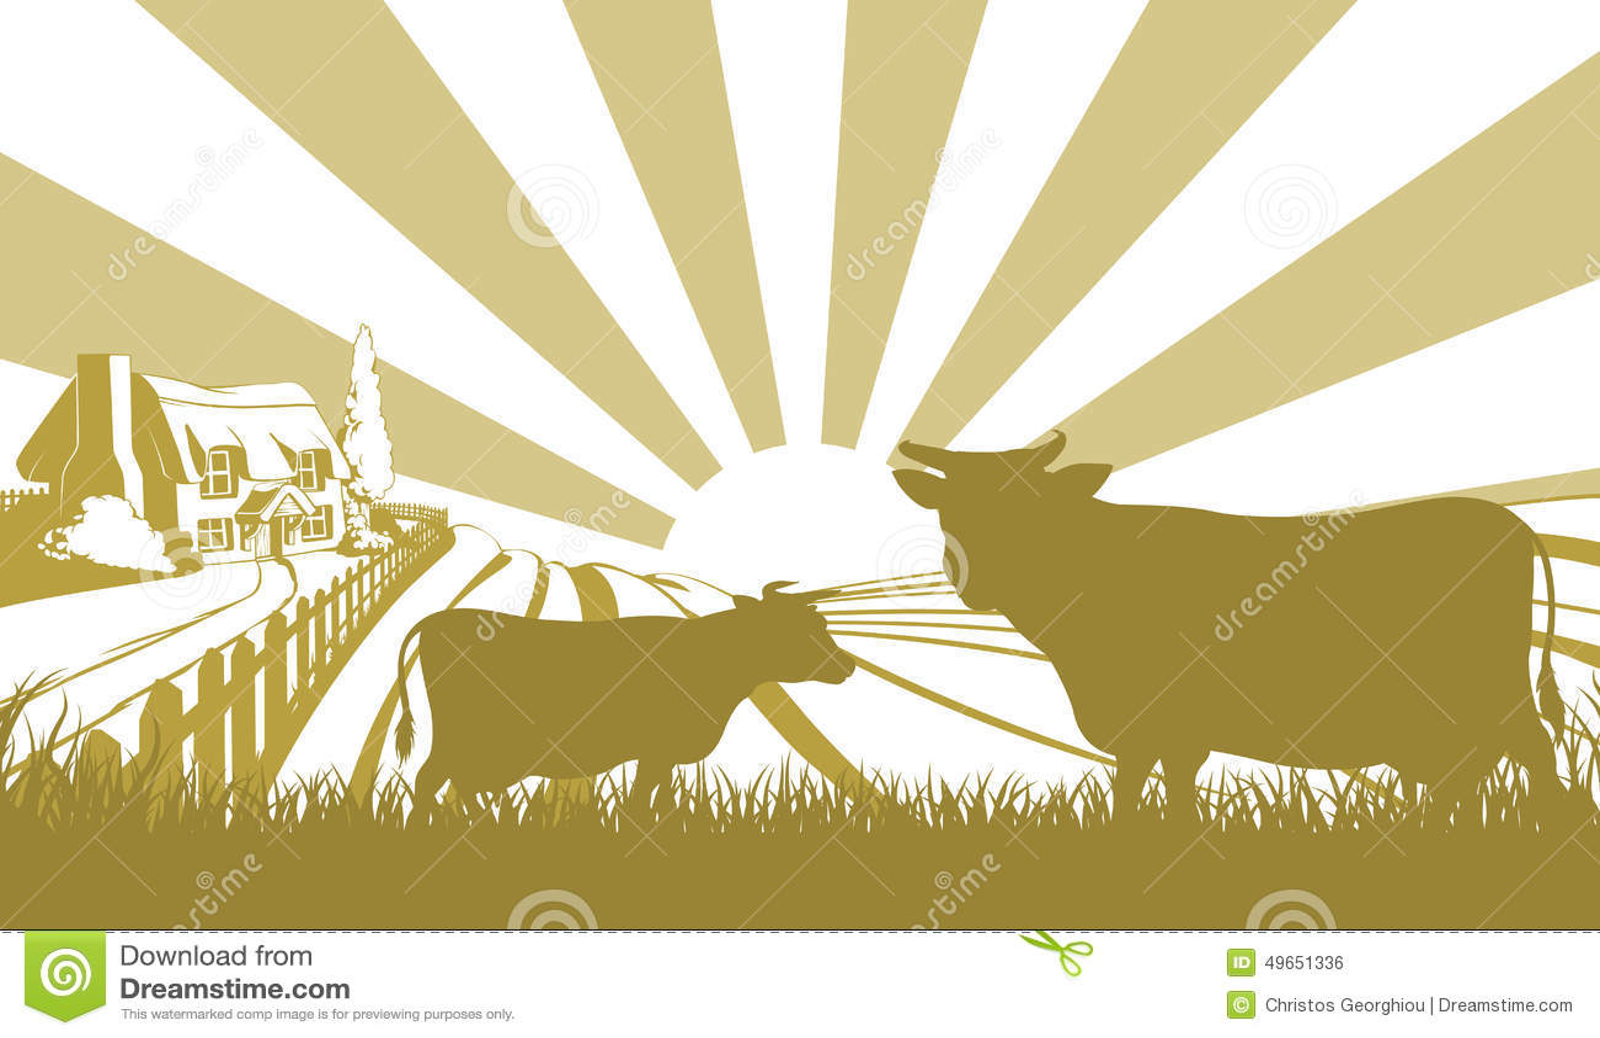 Farm Style House Plans Cattle Farm Scene Stock Vector Image 49651336